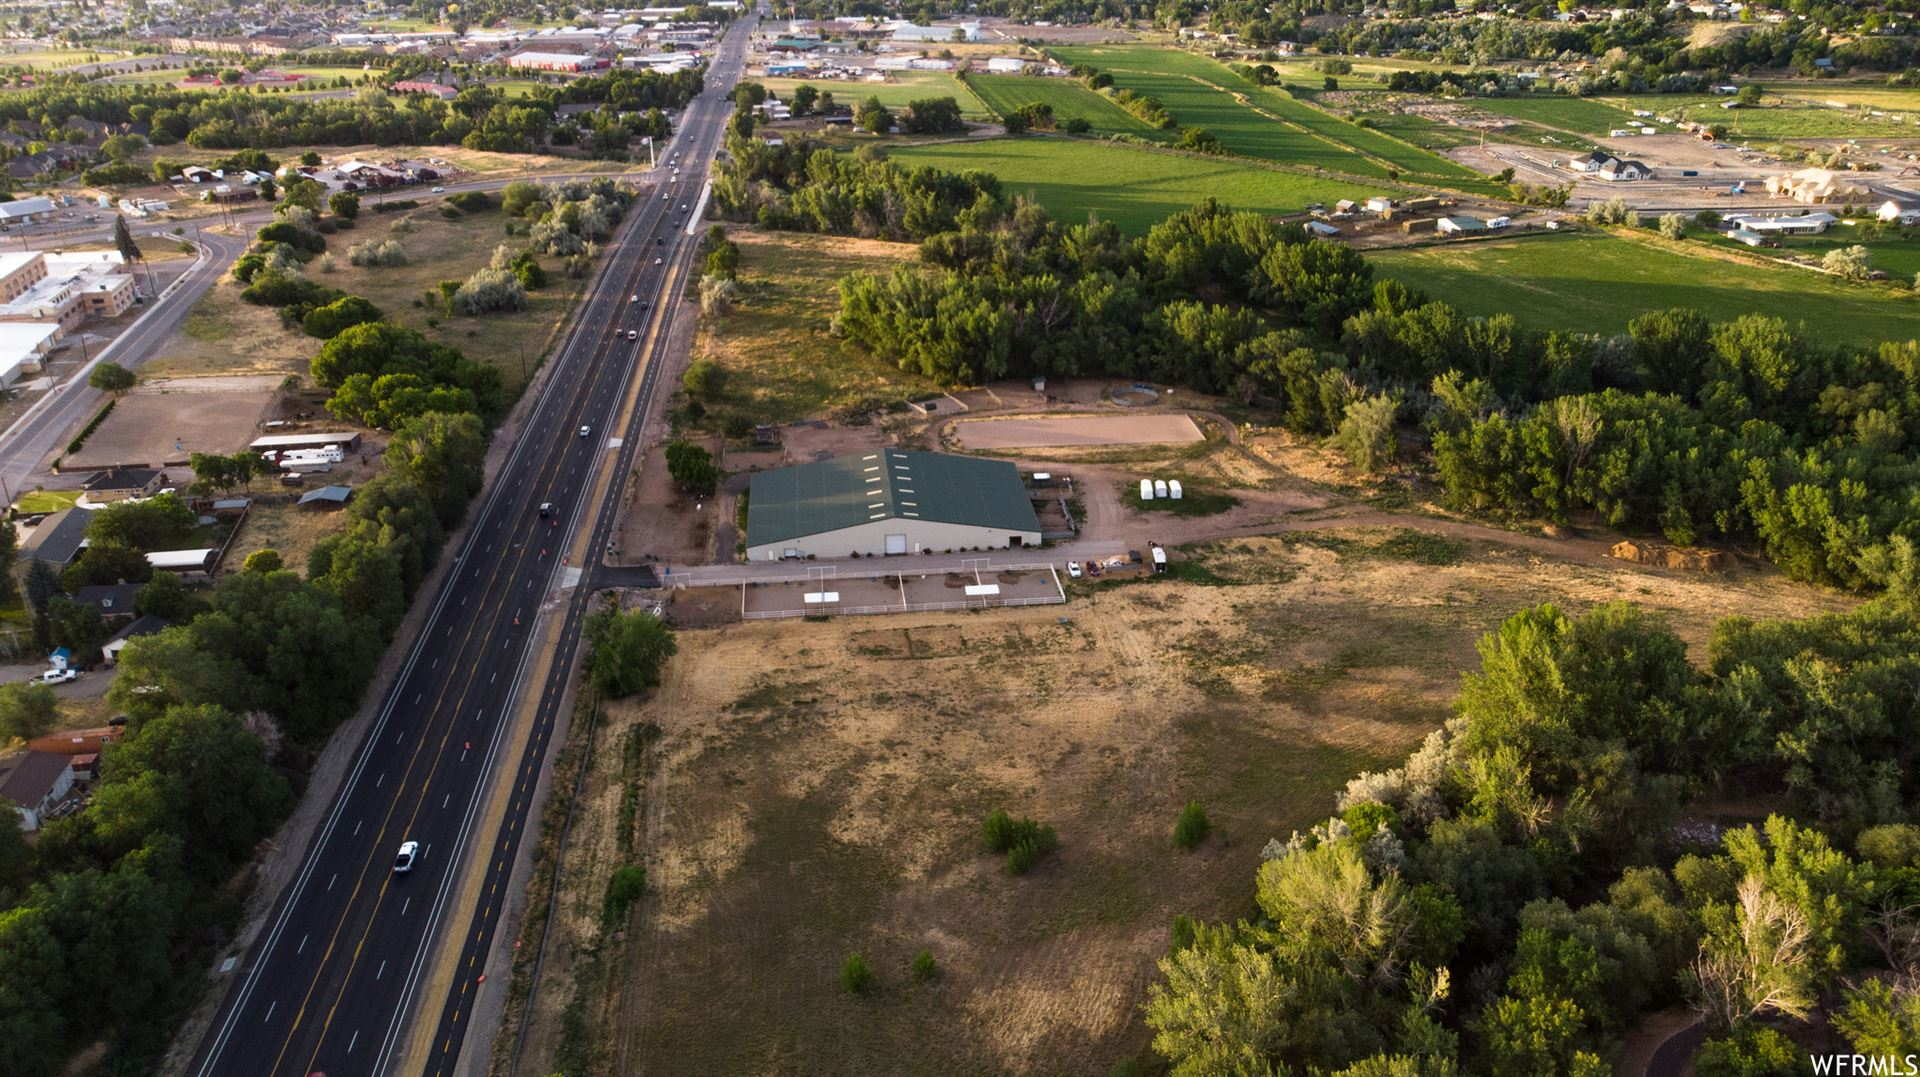 Photo of 1527 S MAIN ST, Spanish Fork, UT 84660 (MLS # 1684405)